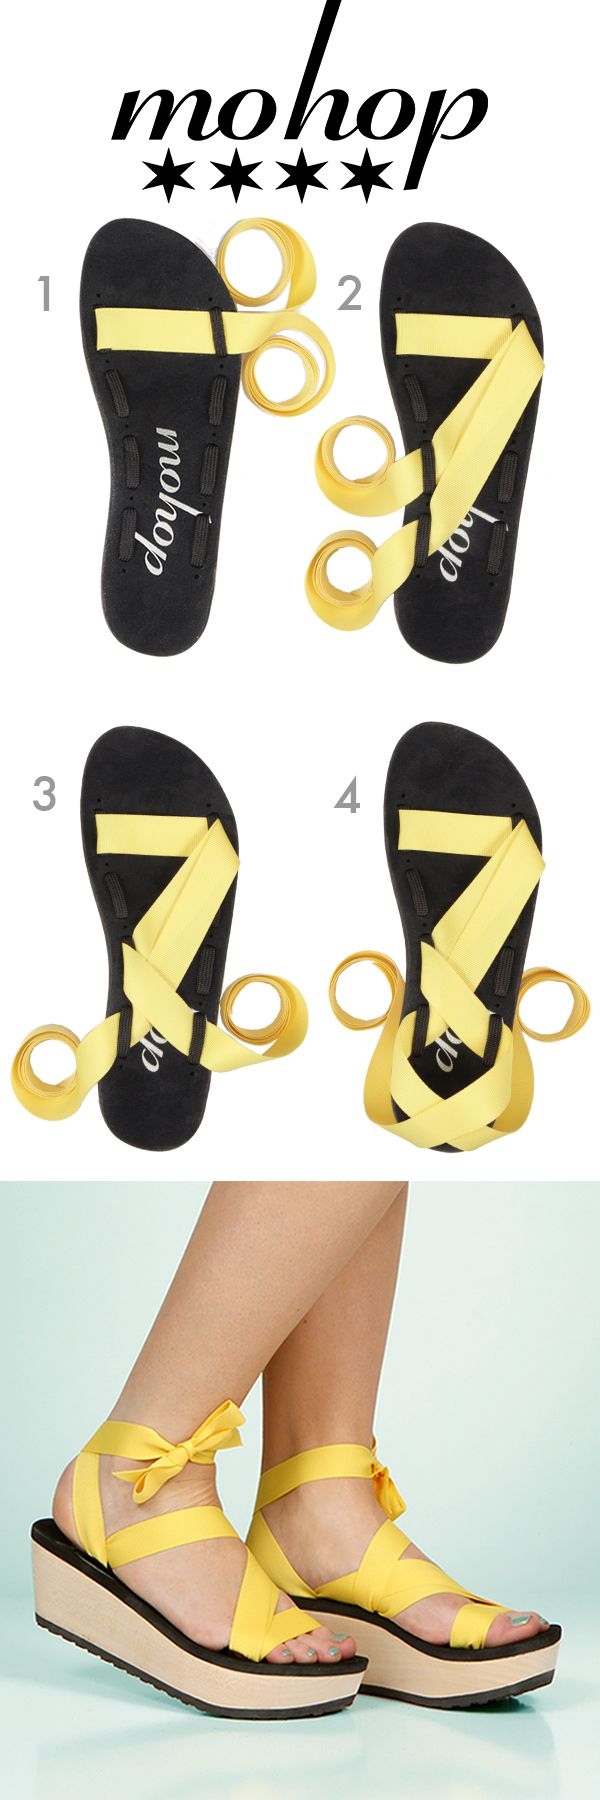 New Mokobo Styling Card. Infinitely Interchangeable Ribbon Sandals!